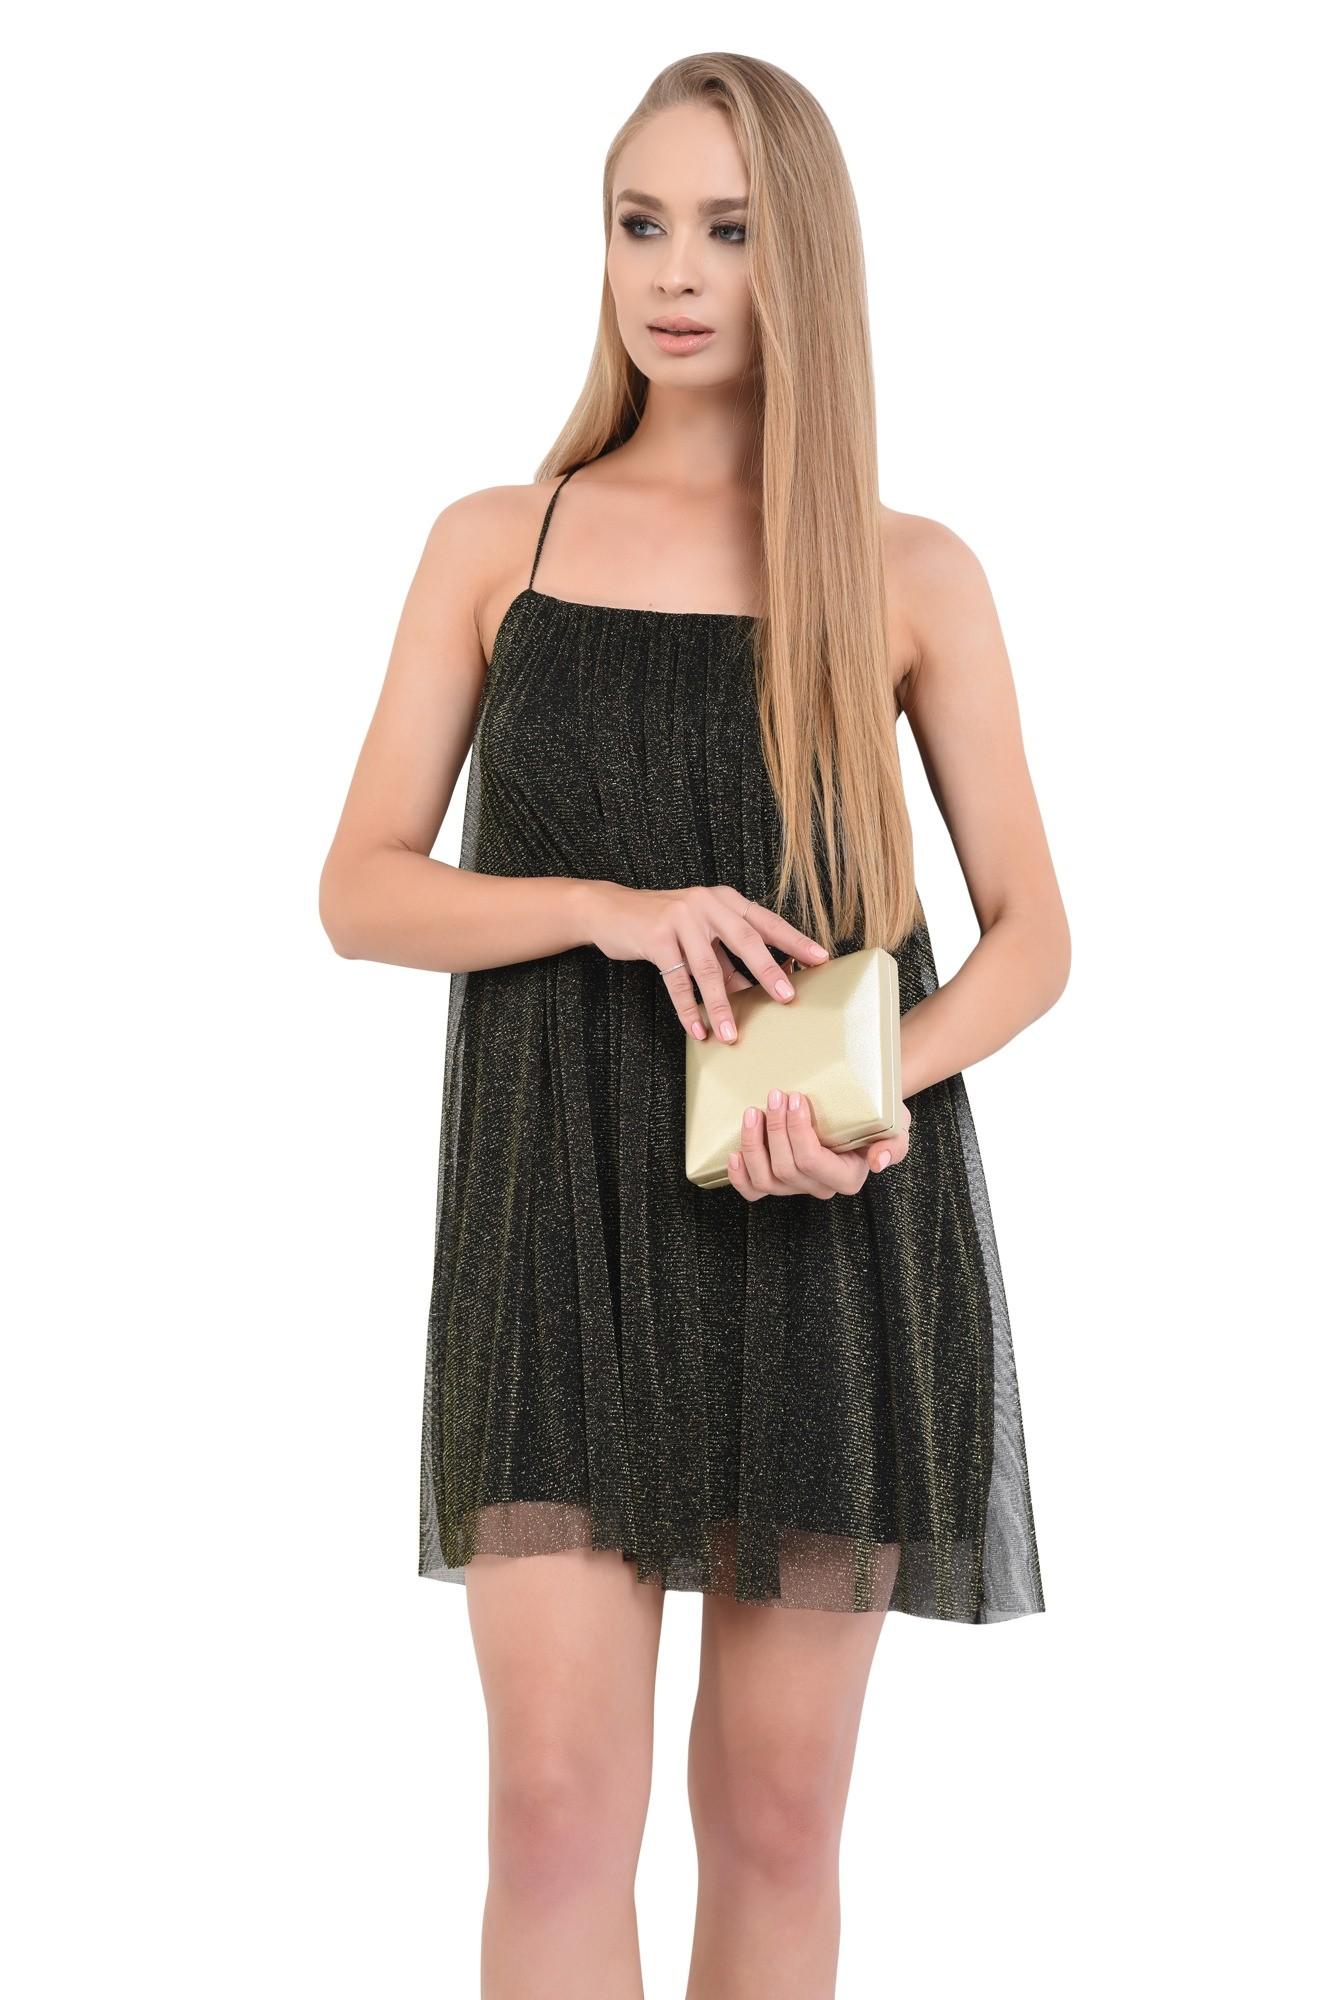 0 - rochie eleganta, negru, bretele subtiri, mini